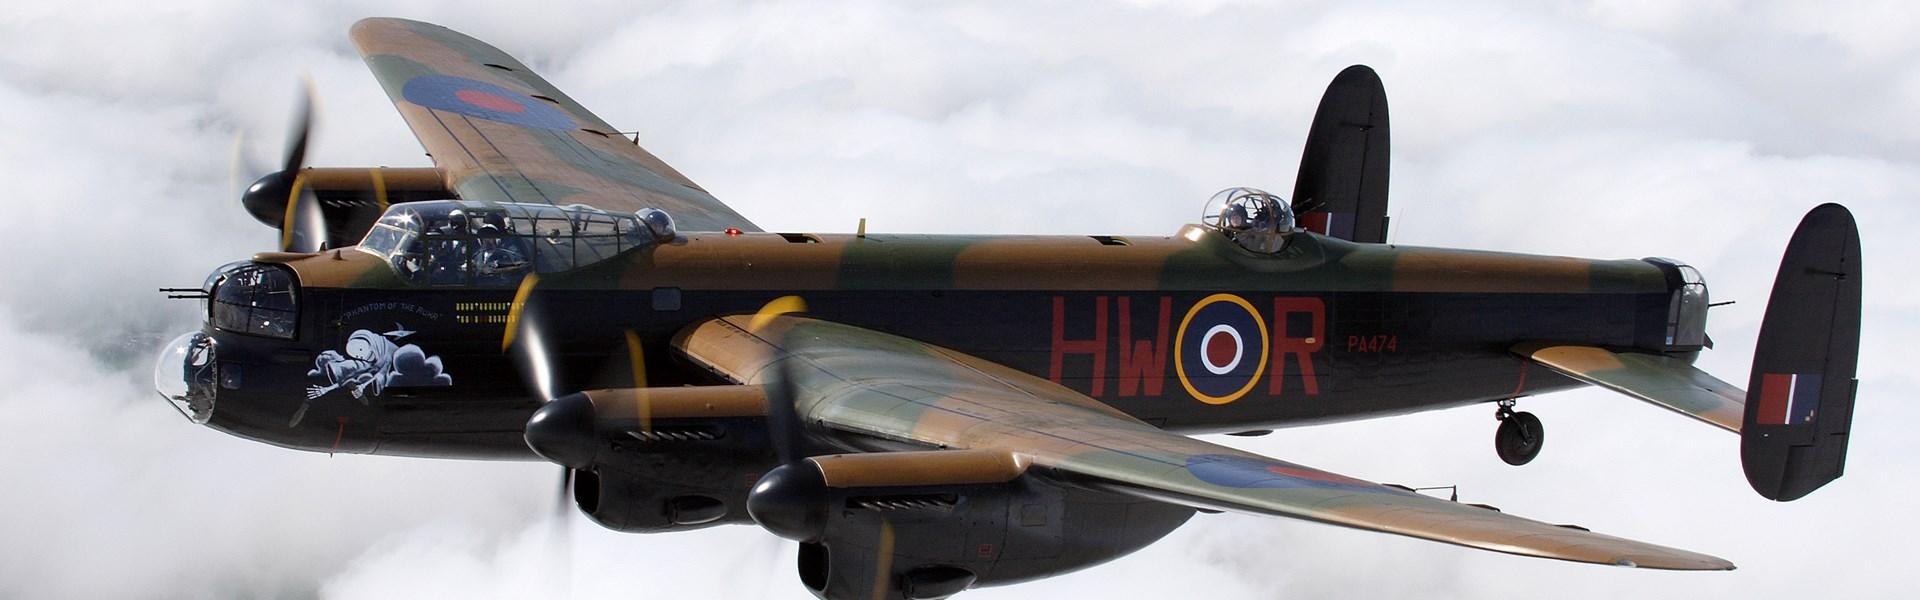 The amazing Lancaster Bomber